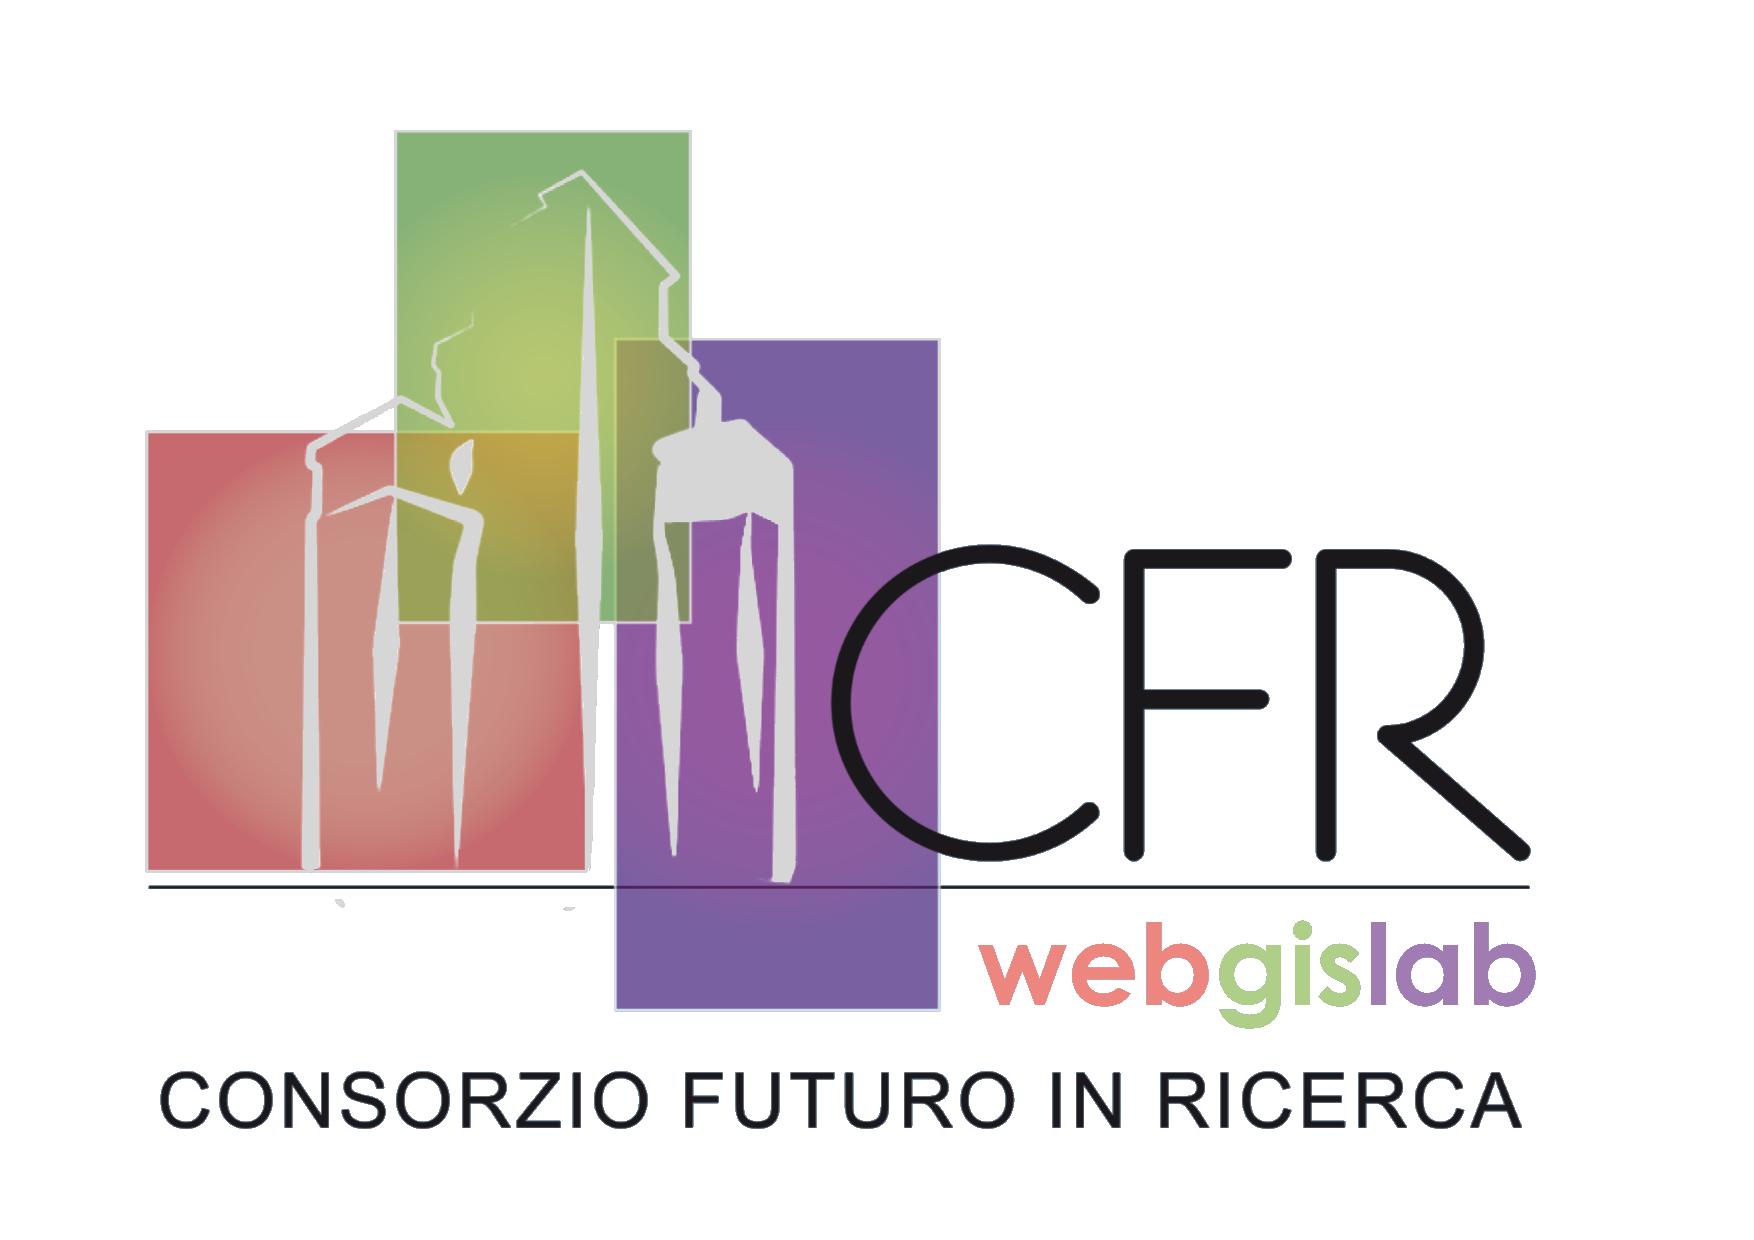 CFR webgislab